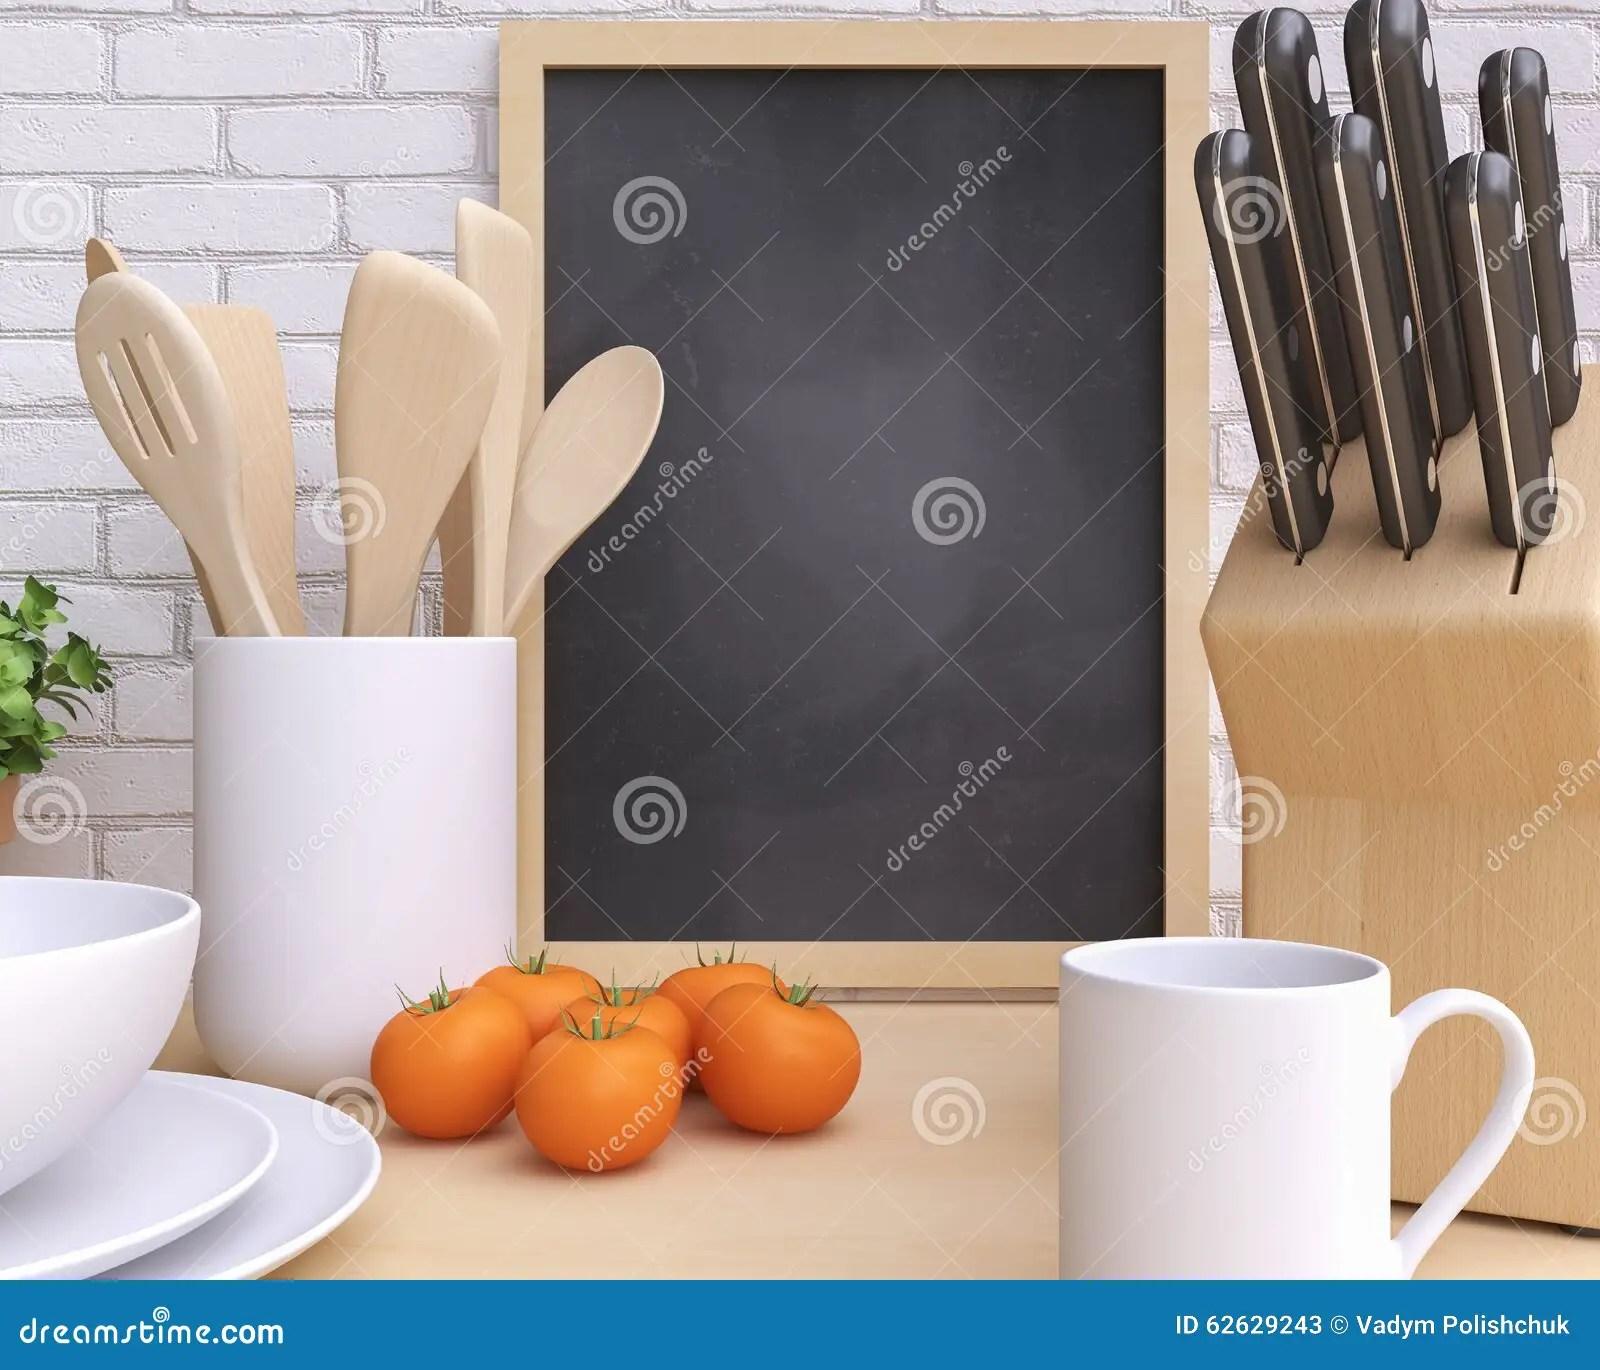 model kitchens gray kitchen chairs 有桌和厨具的烙记的大模型厨房库存图片 图片包括有背包 厨师 急性 有桌和厨具的烙记的大模型厨房